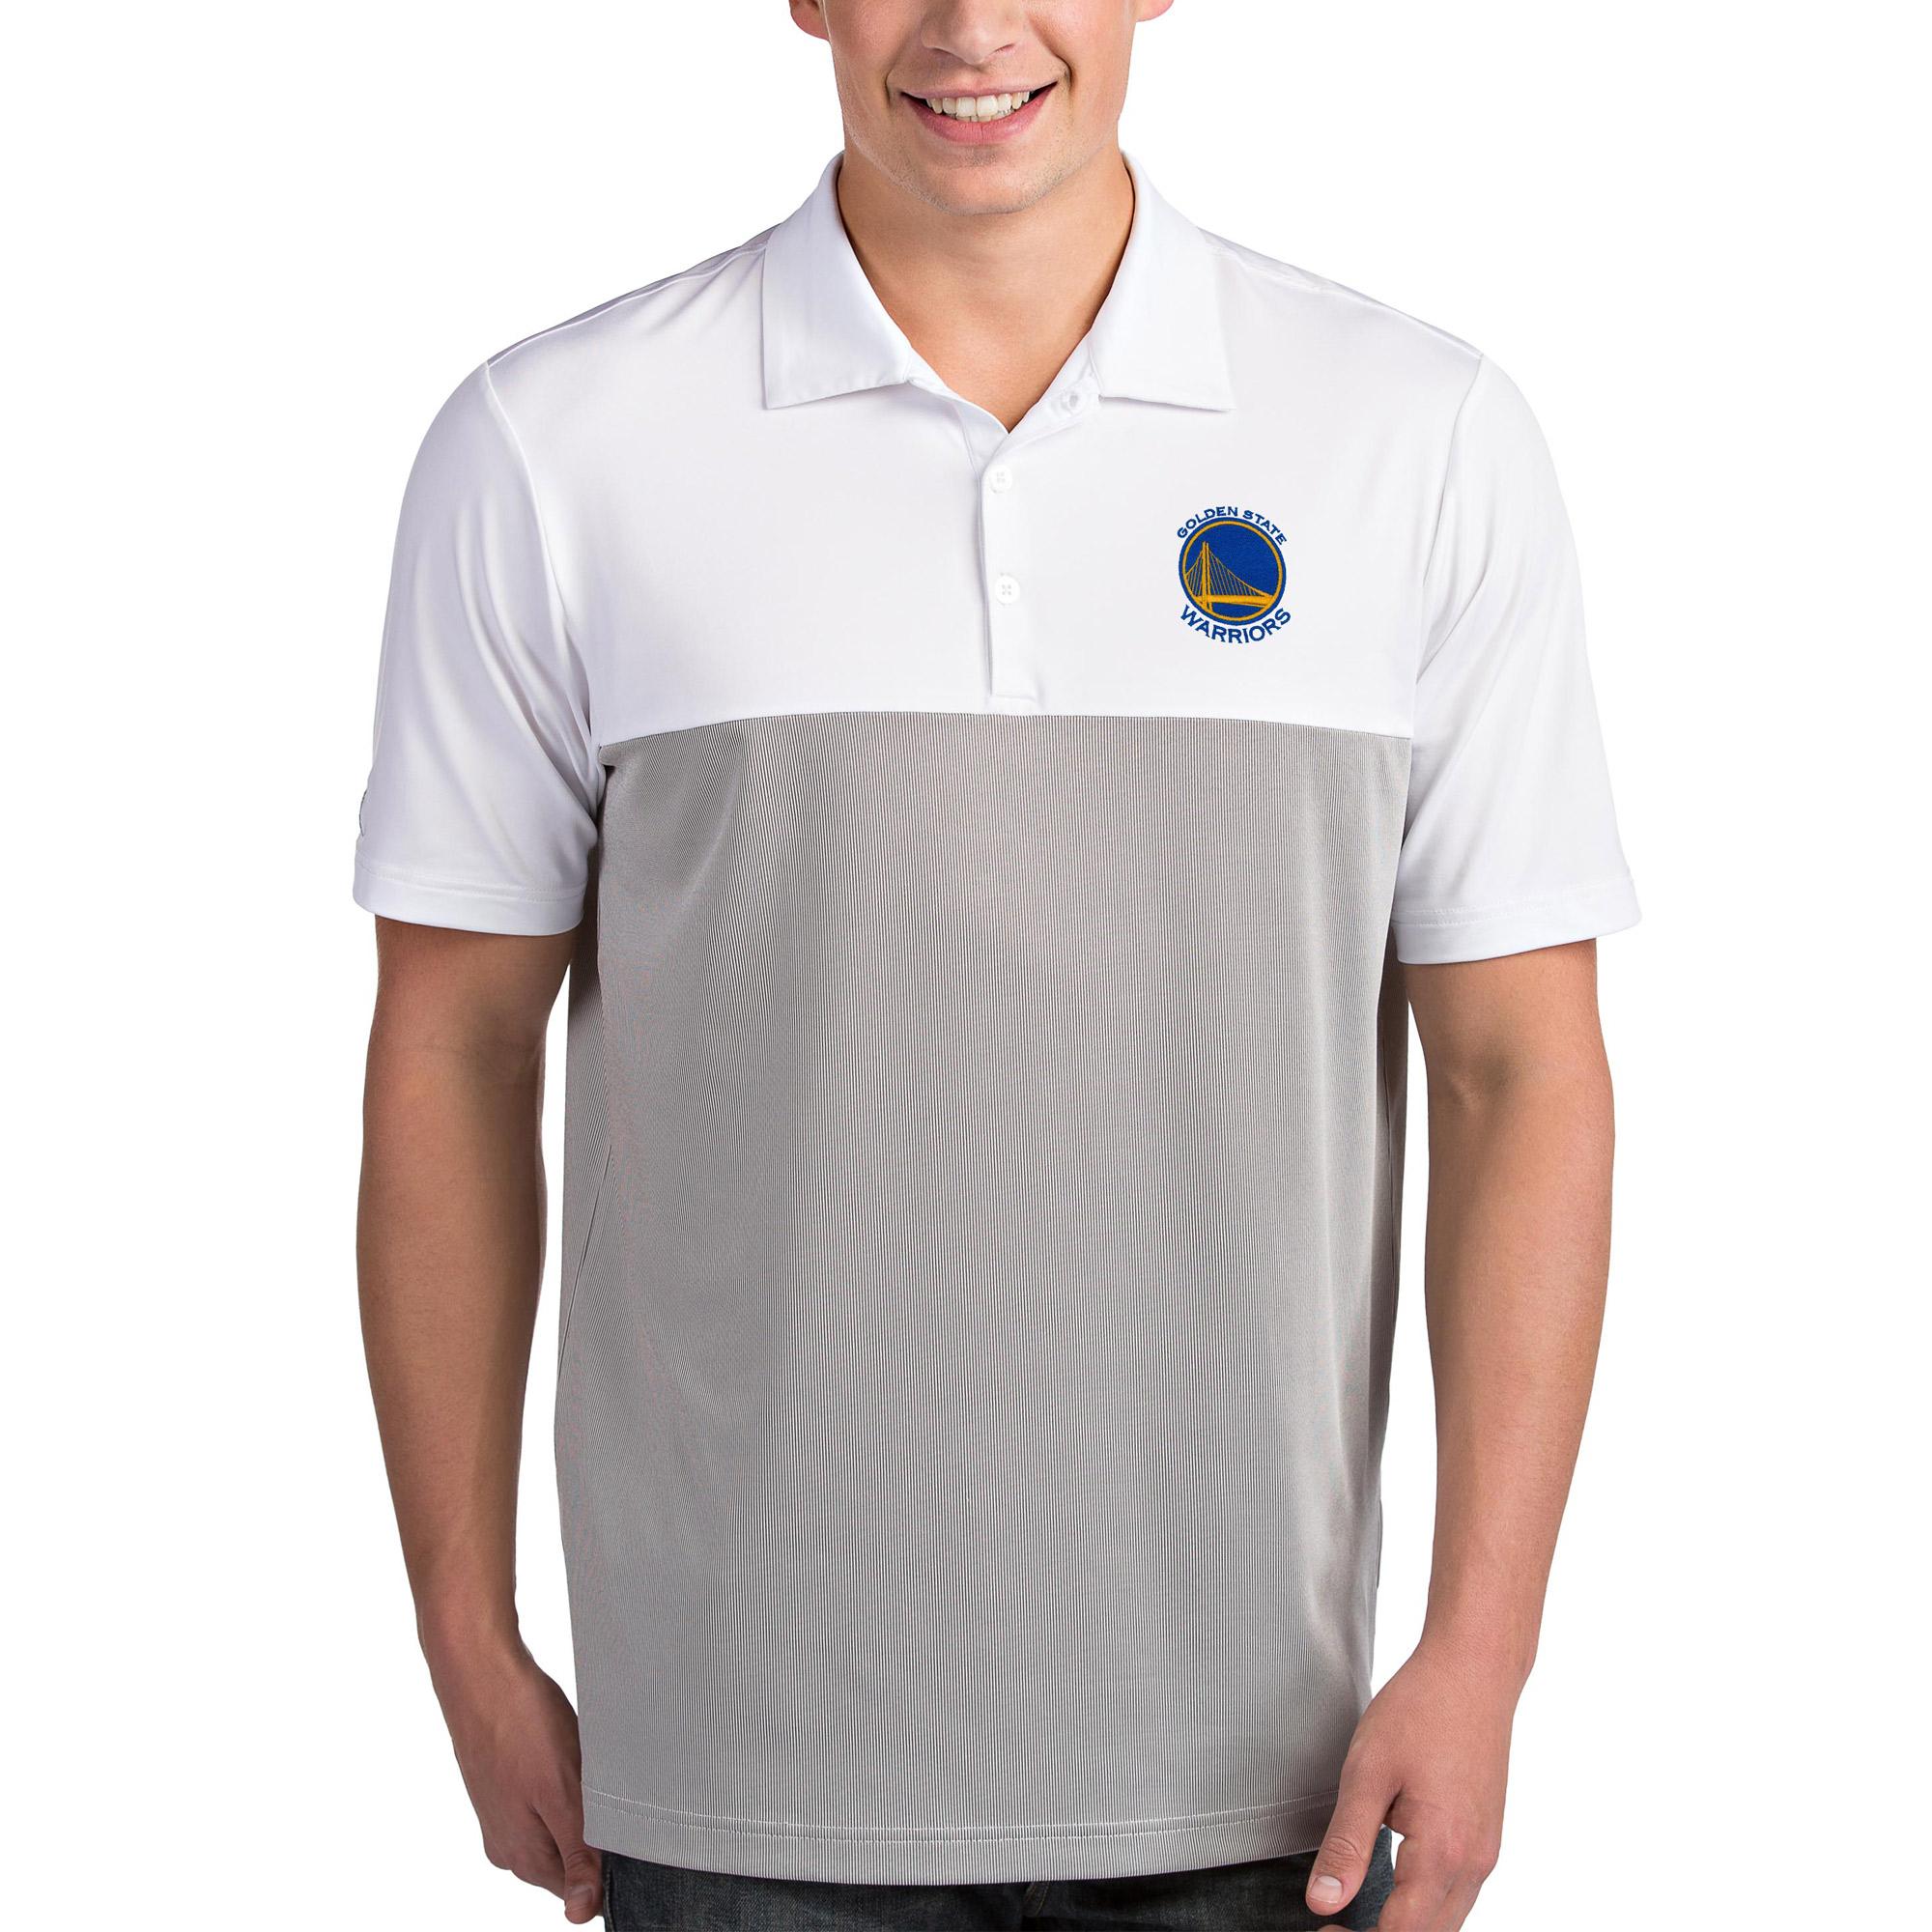 Golden State Warriors Antigua Venture Polo - White/Gray